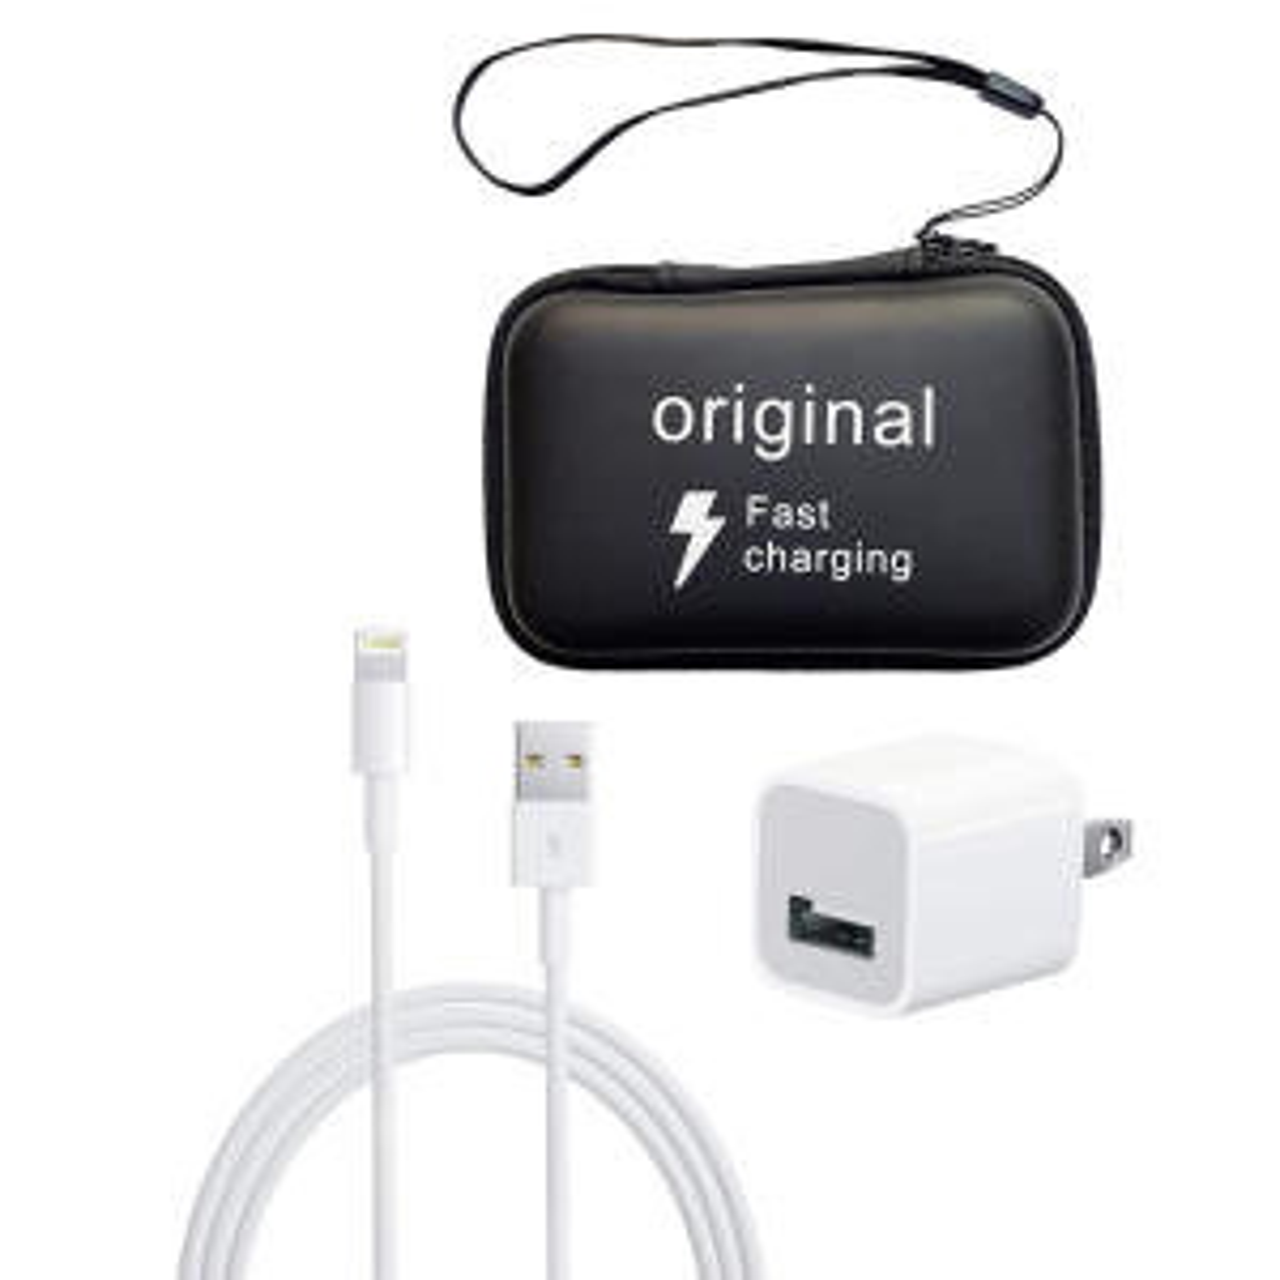 مجموعه لوازم جانبی گوشی موبایل مدل DST-1008